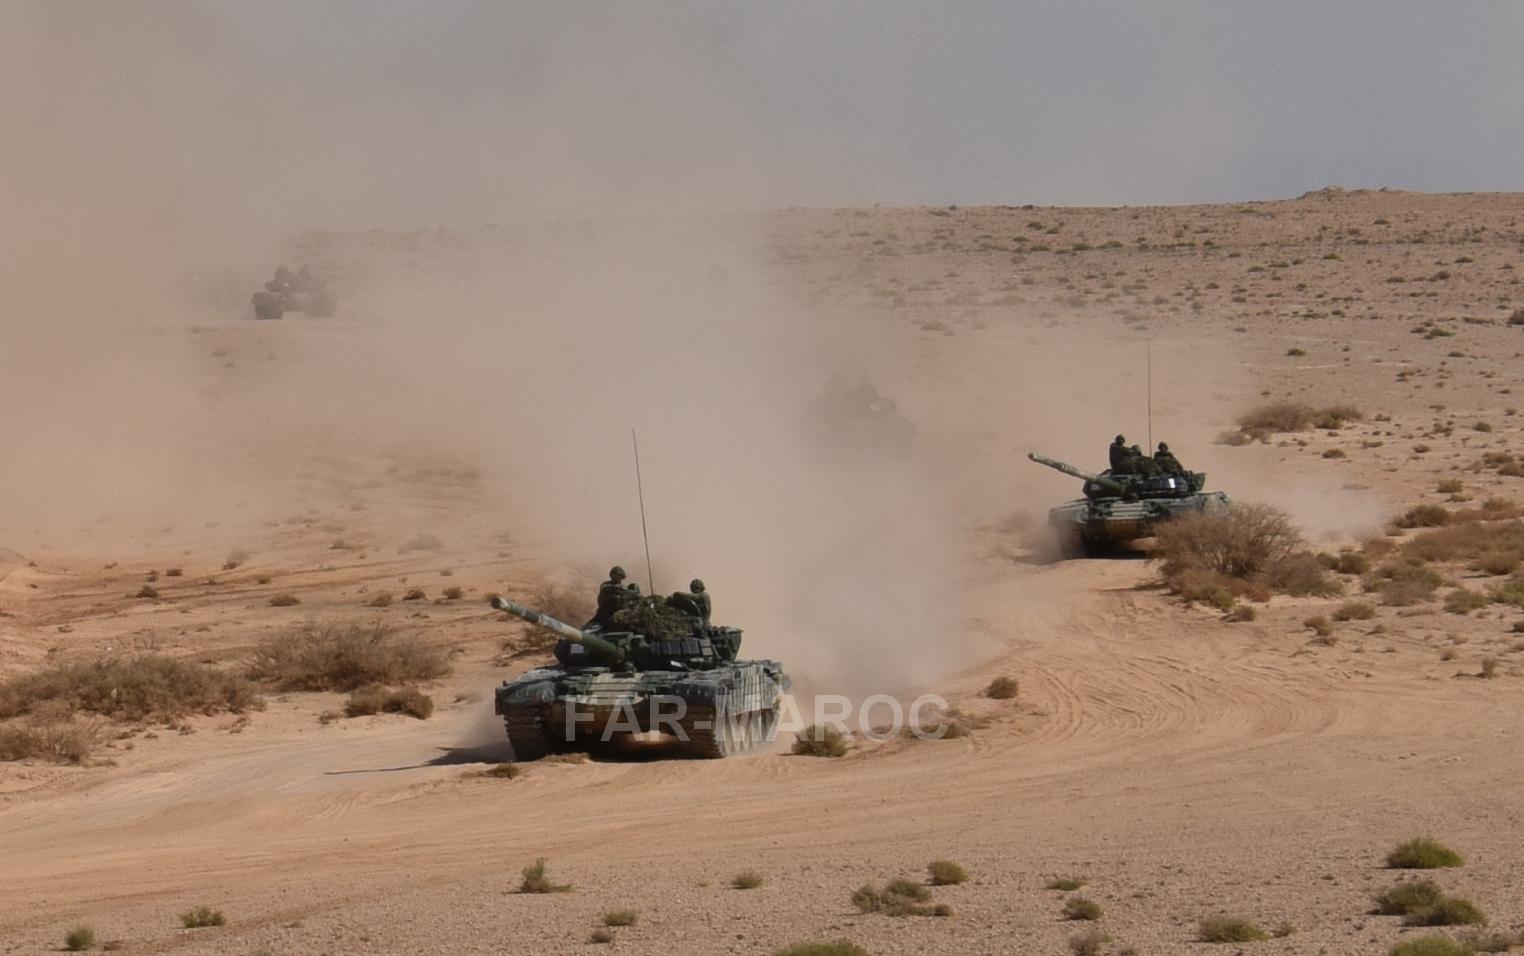 Chars T-72B/BK MArocains // Moroccan Army T-72B/BK Tanks - Page 6 49275613096_b2fc7180a5_o